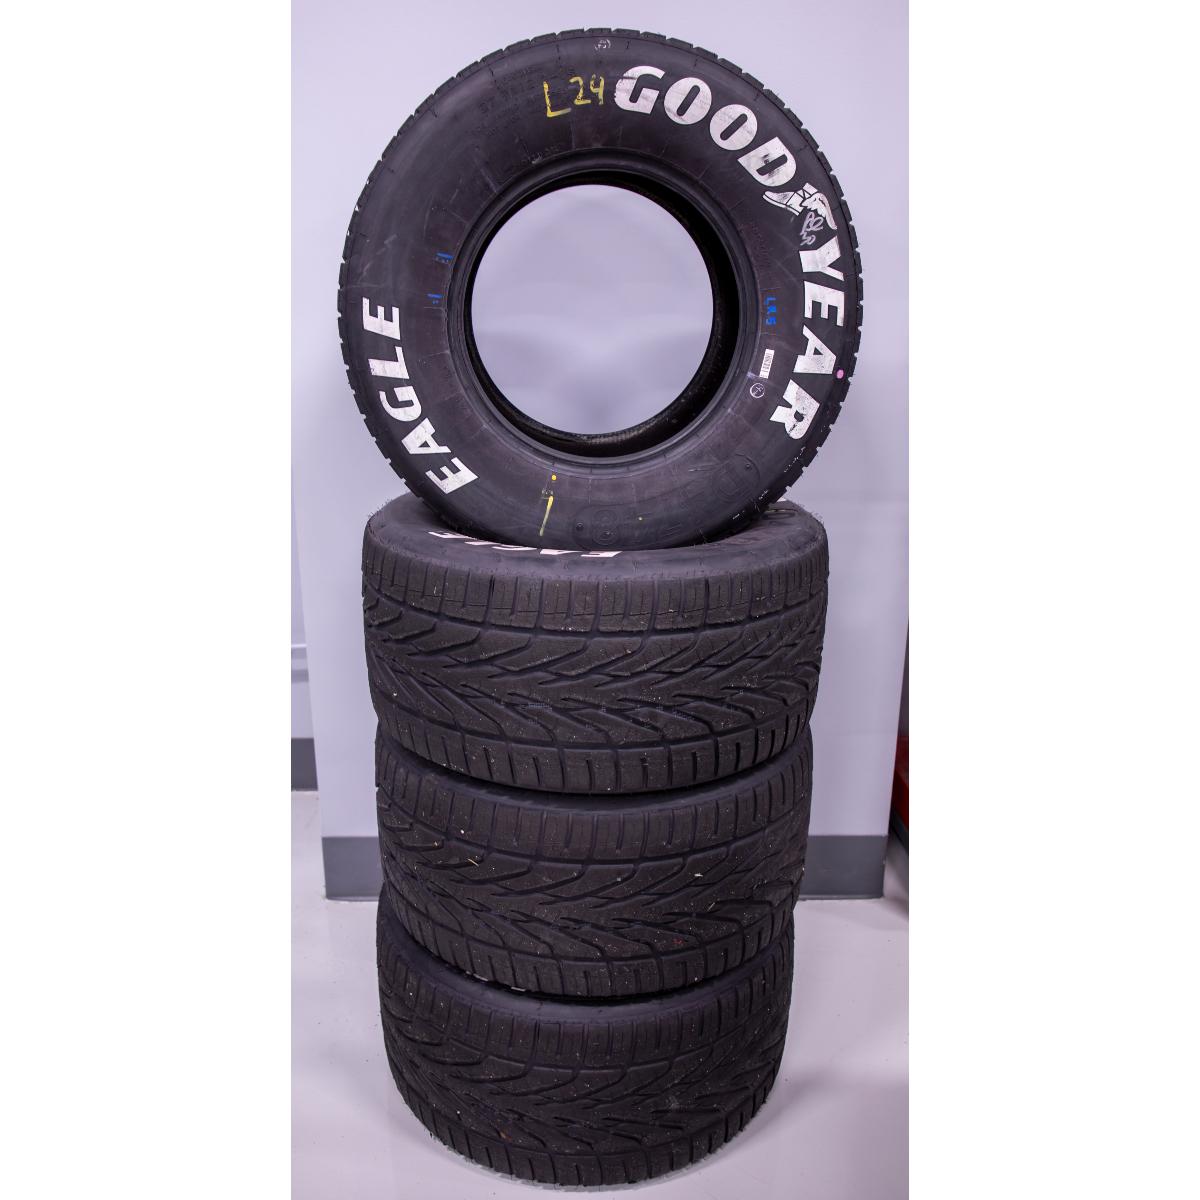 Race Used 2021 William Byron #24 COTA Rain Tire - Austin (5/23/2021)